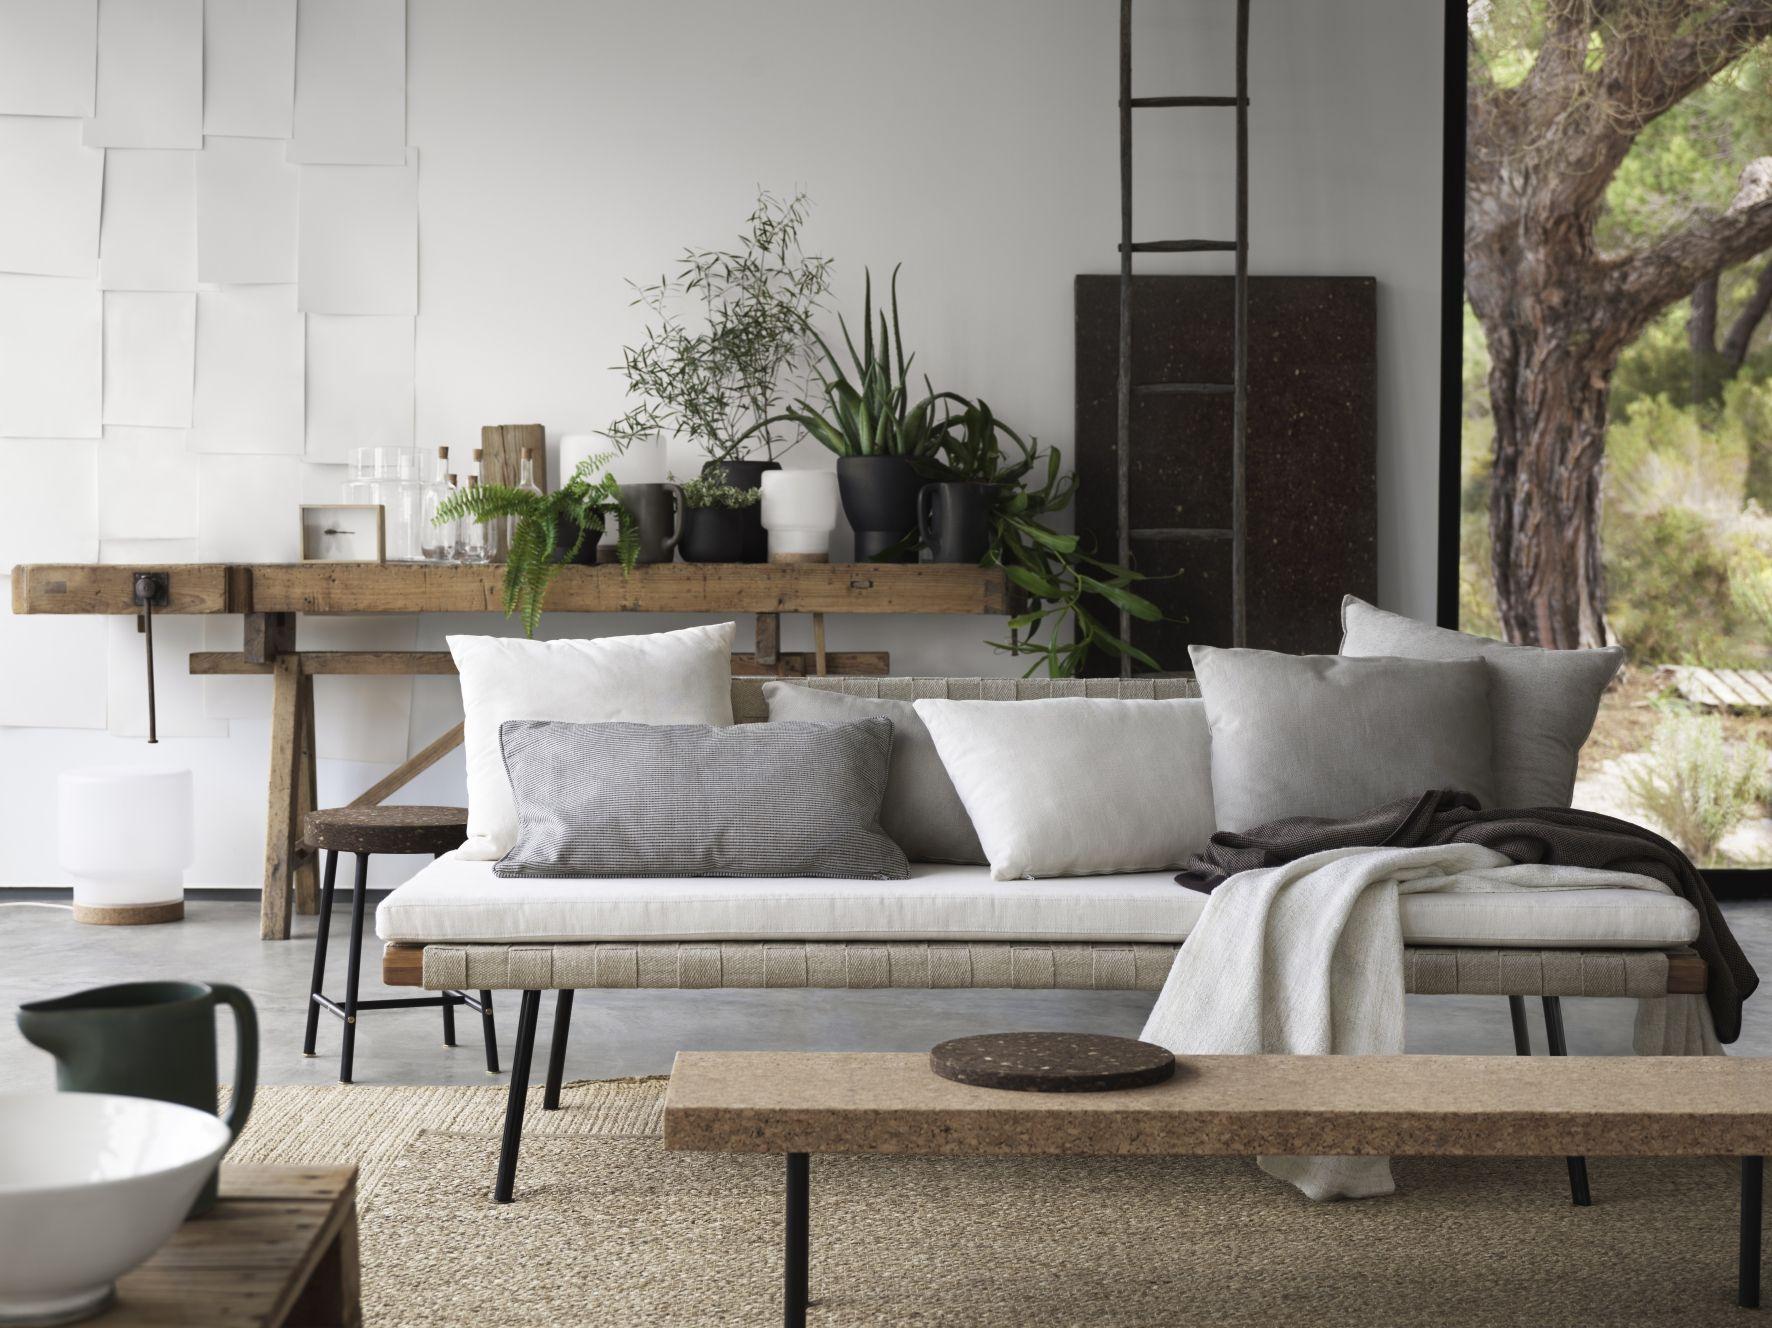 Ikea 2016 Highlights Minimalist Living Room Interior Design Home [ 1328 x 1772 Pixel ]